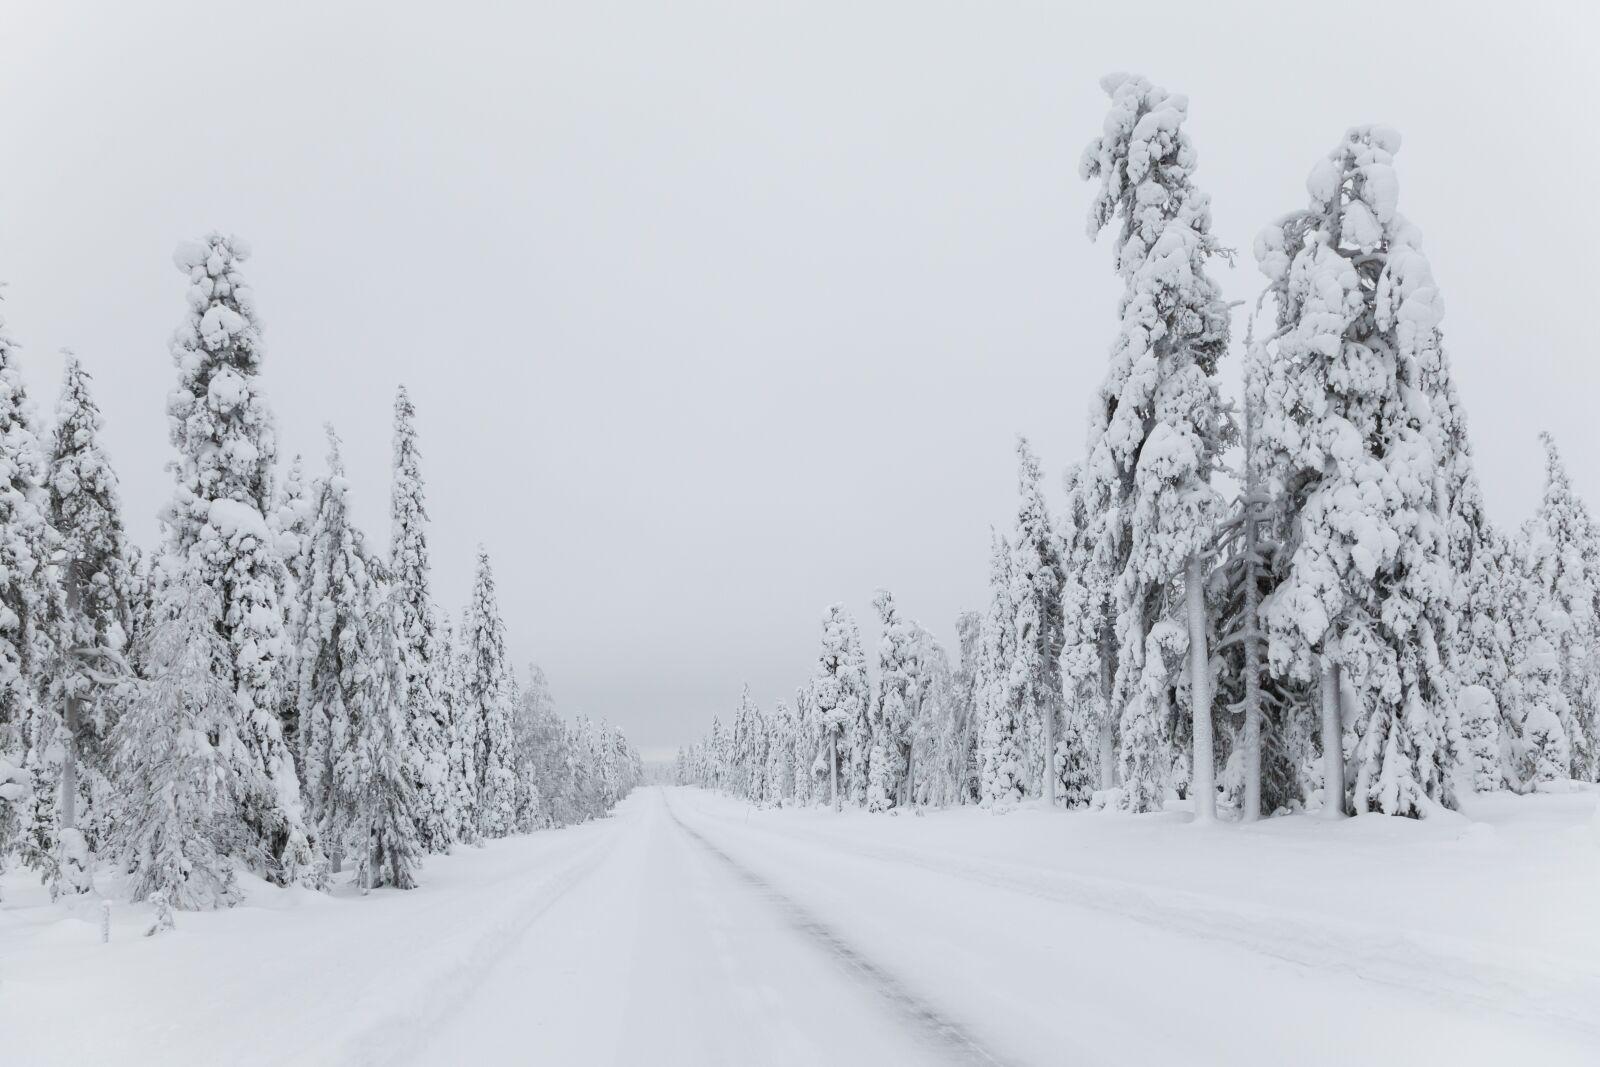 snow, winter, polar night, Canon EOS 5D MARK II, Canon EF 24-105mm f/4L IS